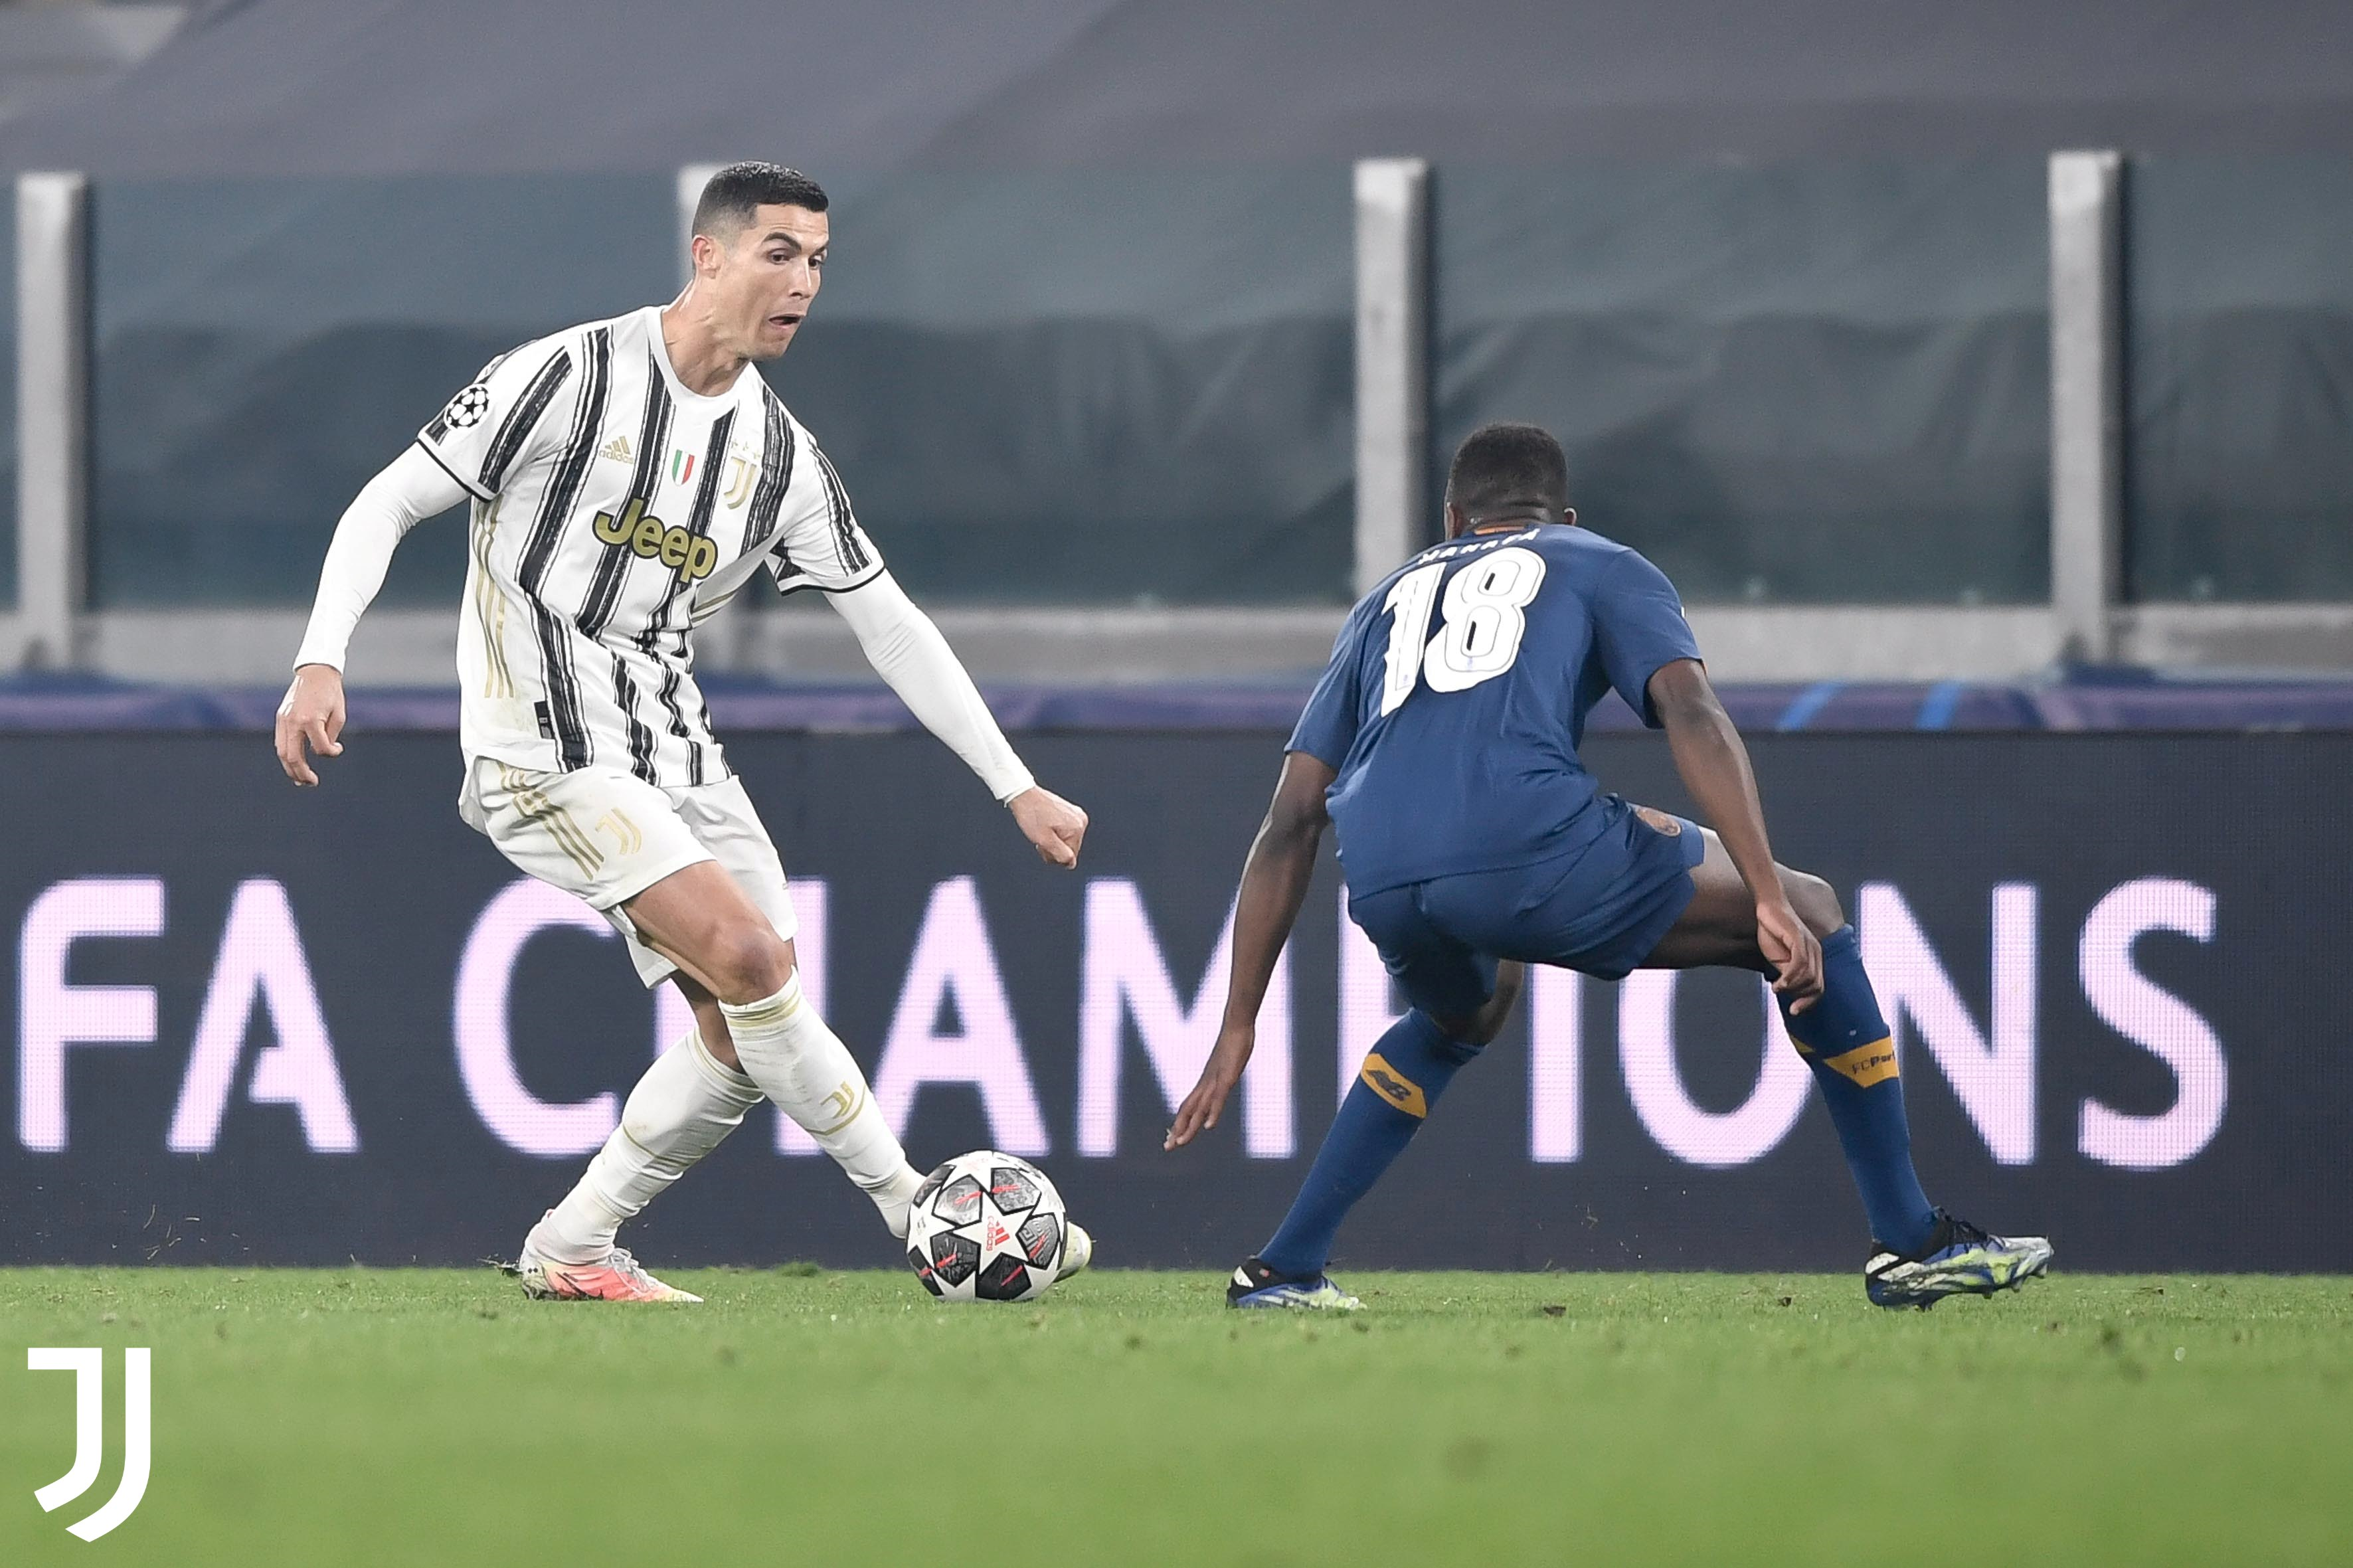 Cristiano Ronaldo quiere regresar al Real Madrid. Foto: Twitter Juventus